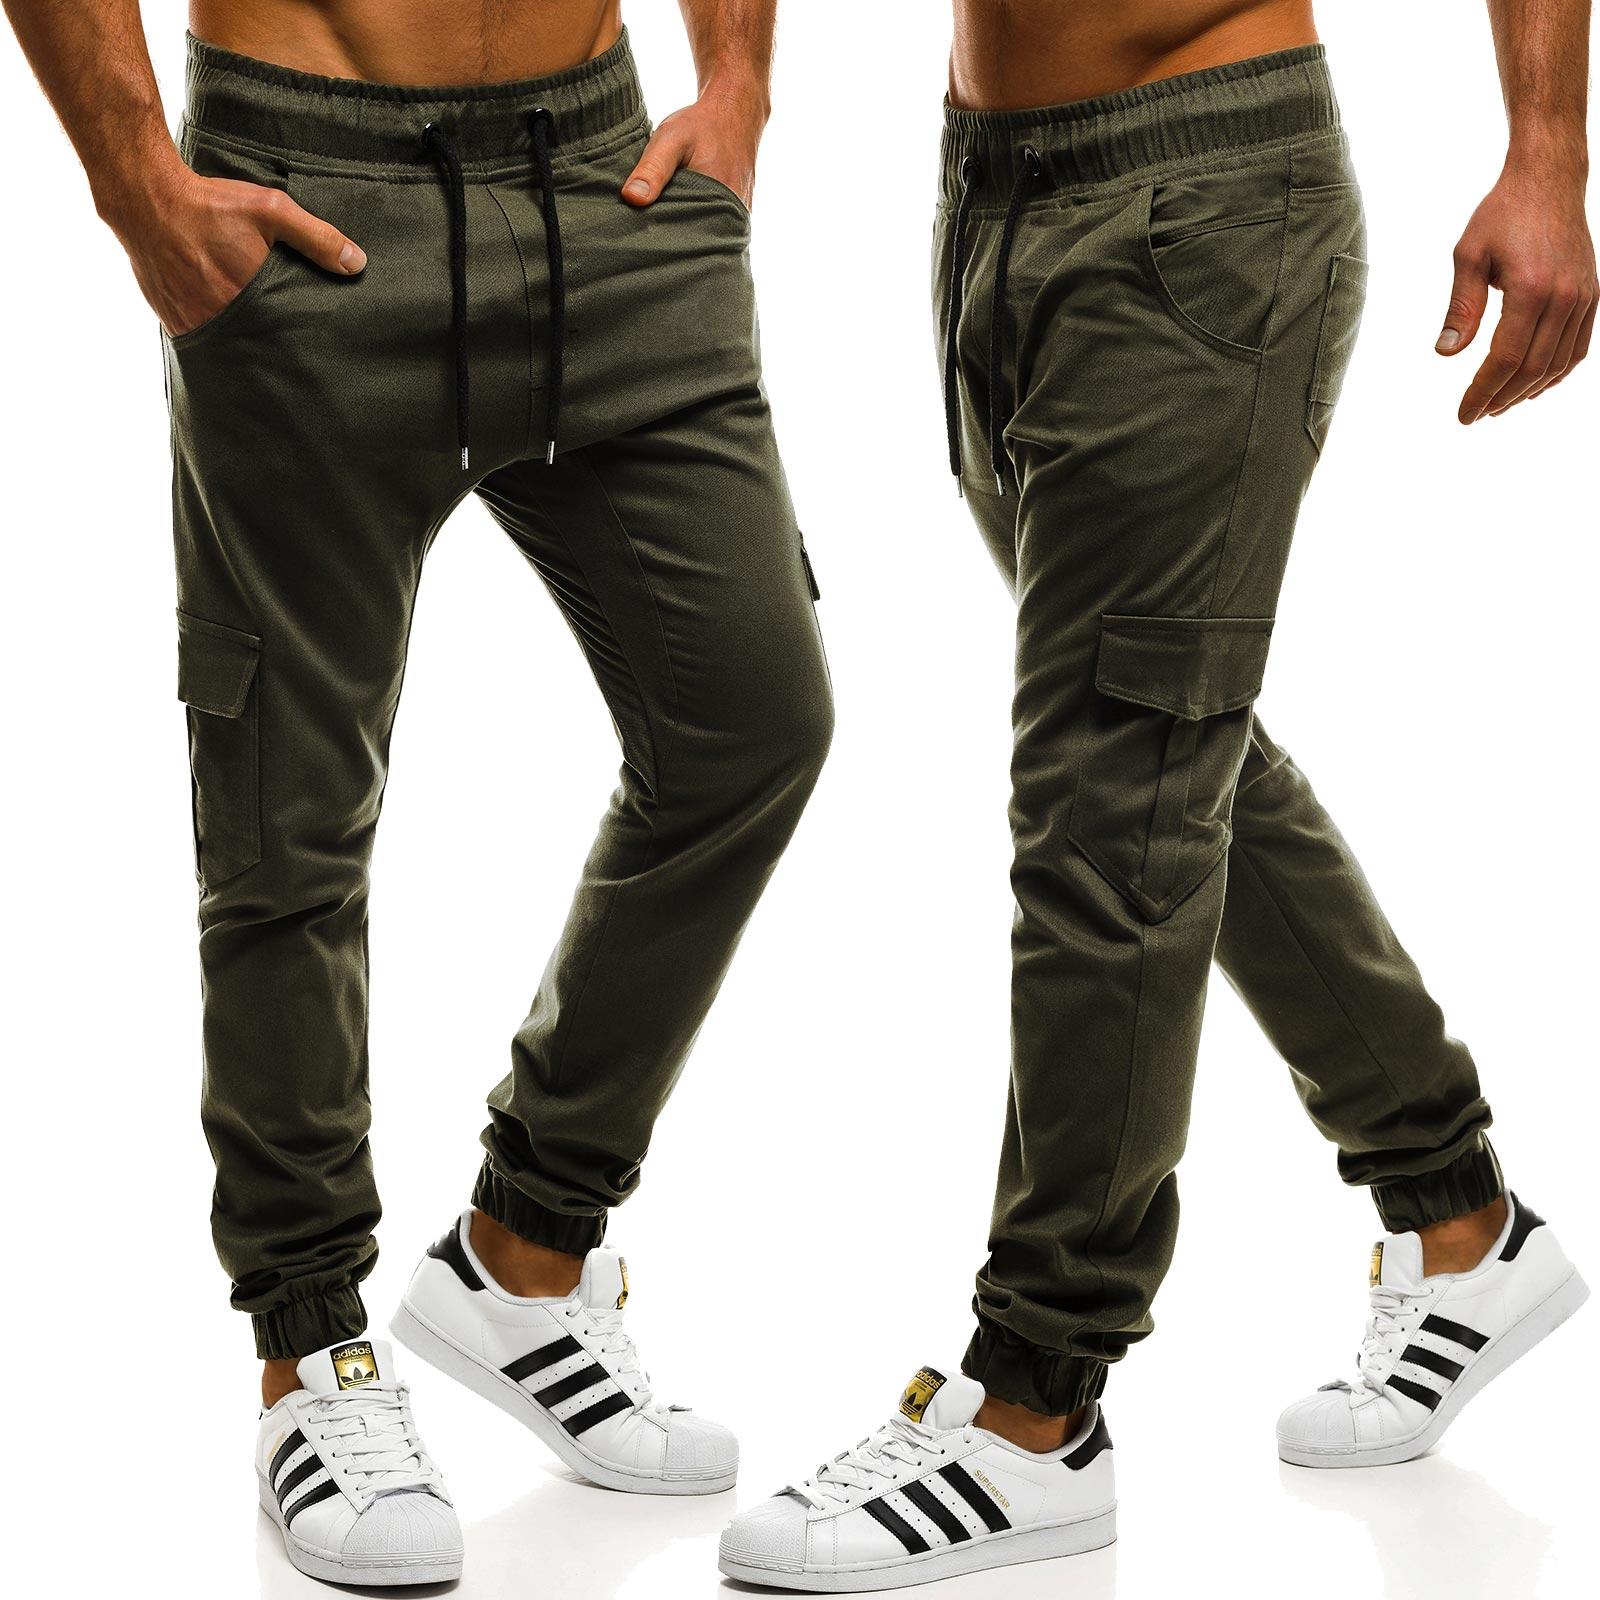 Ozonee athletic pantalones hombre pantalón jogger bombachos pantalones  adidas jpg 1600x1600 Bombachos pantalones adidas d38a2ffa988e5